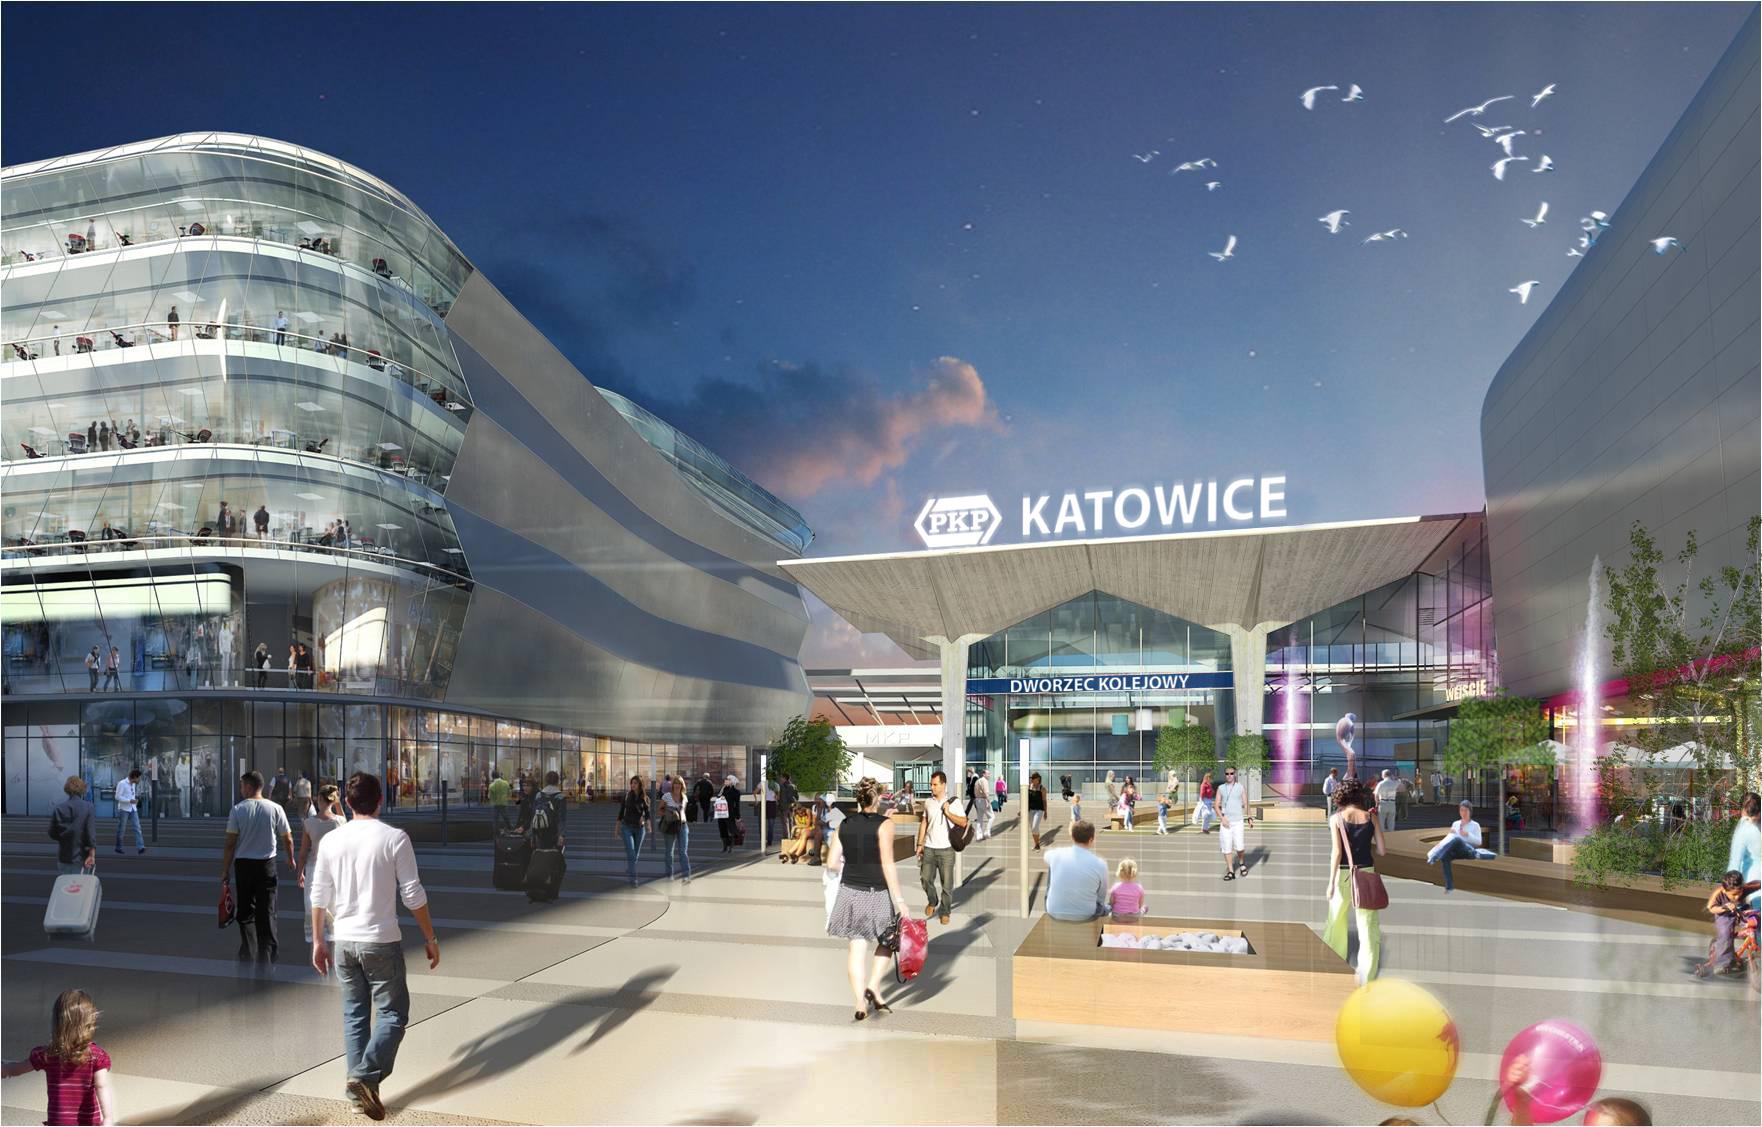 katowice_railway_station_3